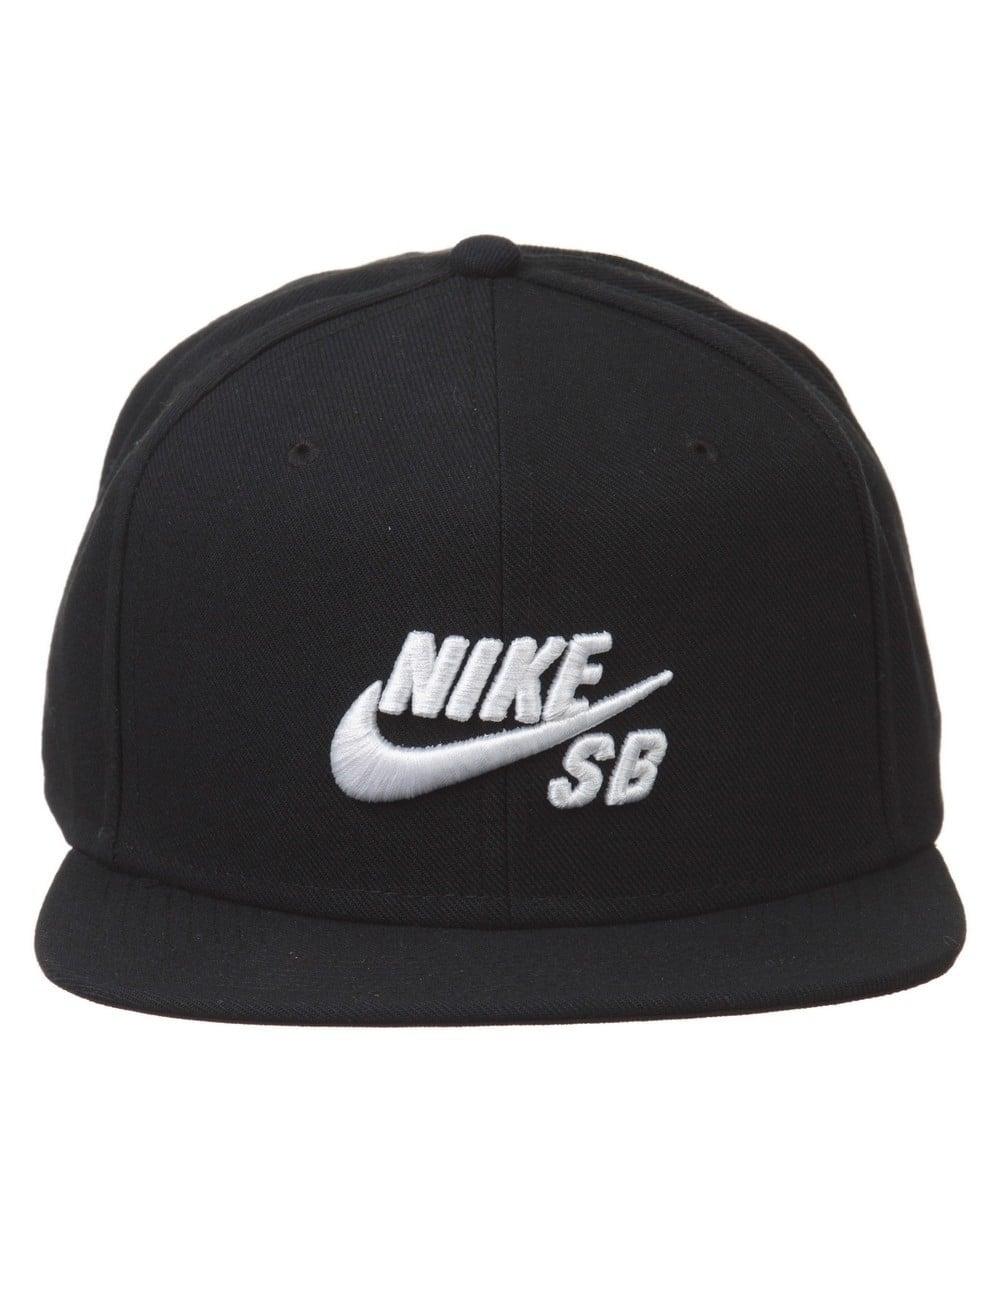 fbc15242 Nike SB Icon Logo Pro Snapback Hat - Black - Hat Shop from Fat ...